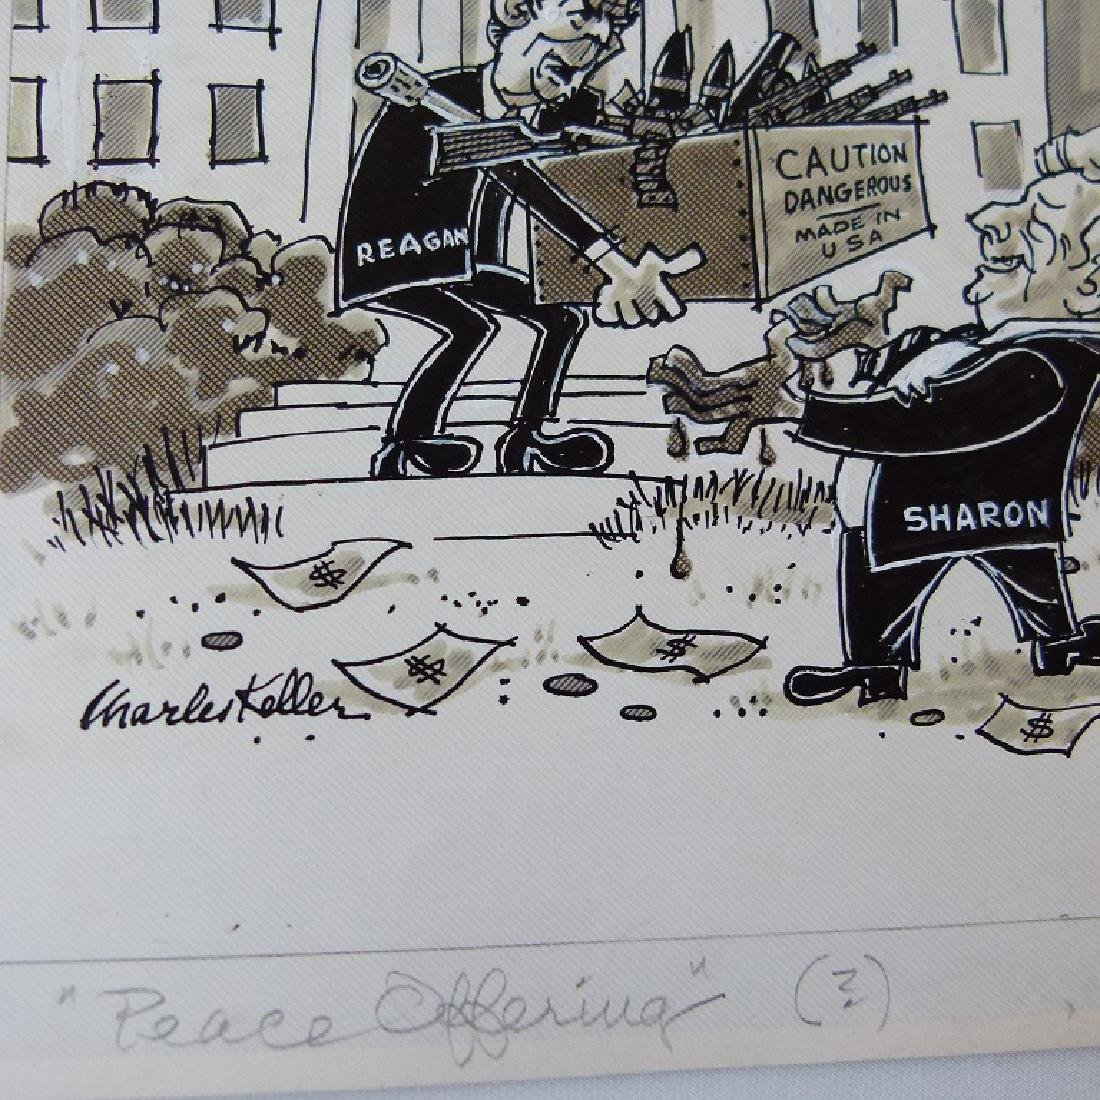 W/C GOUACHE POLITICAL CARTOONS SIGNED KELLER - 5